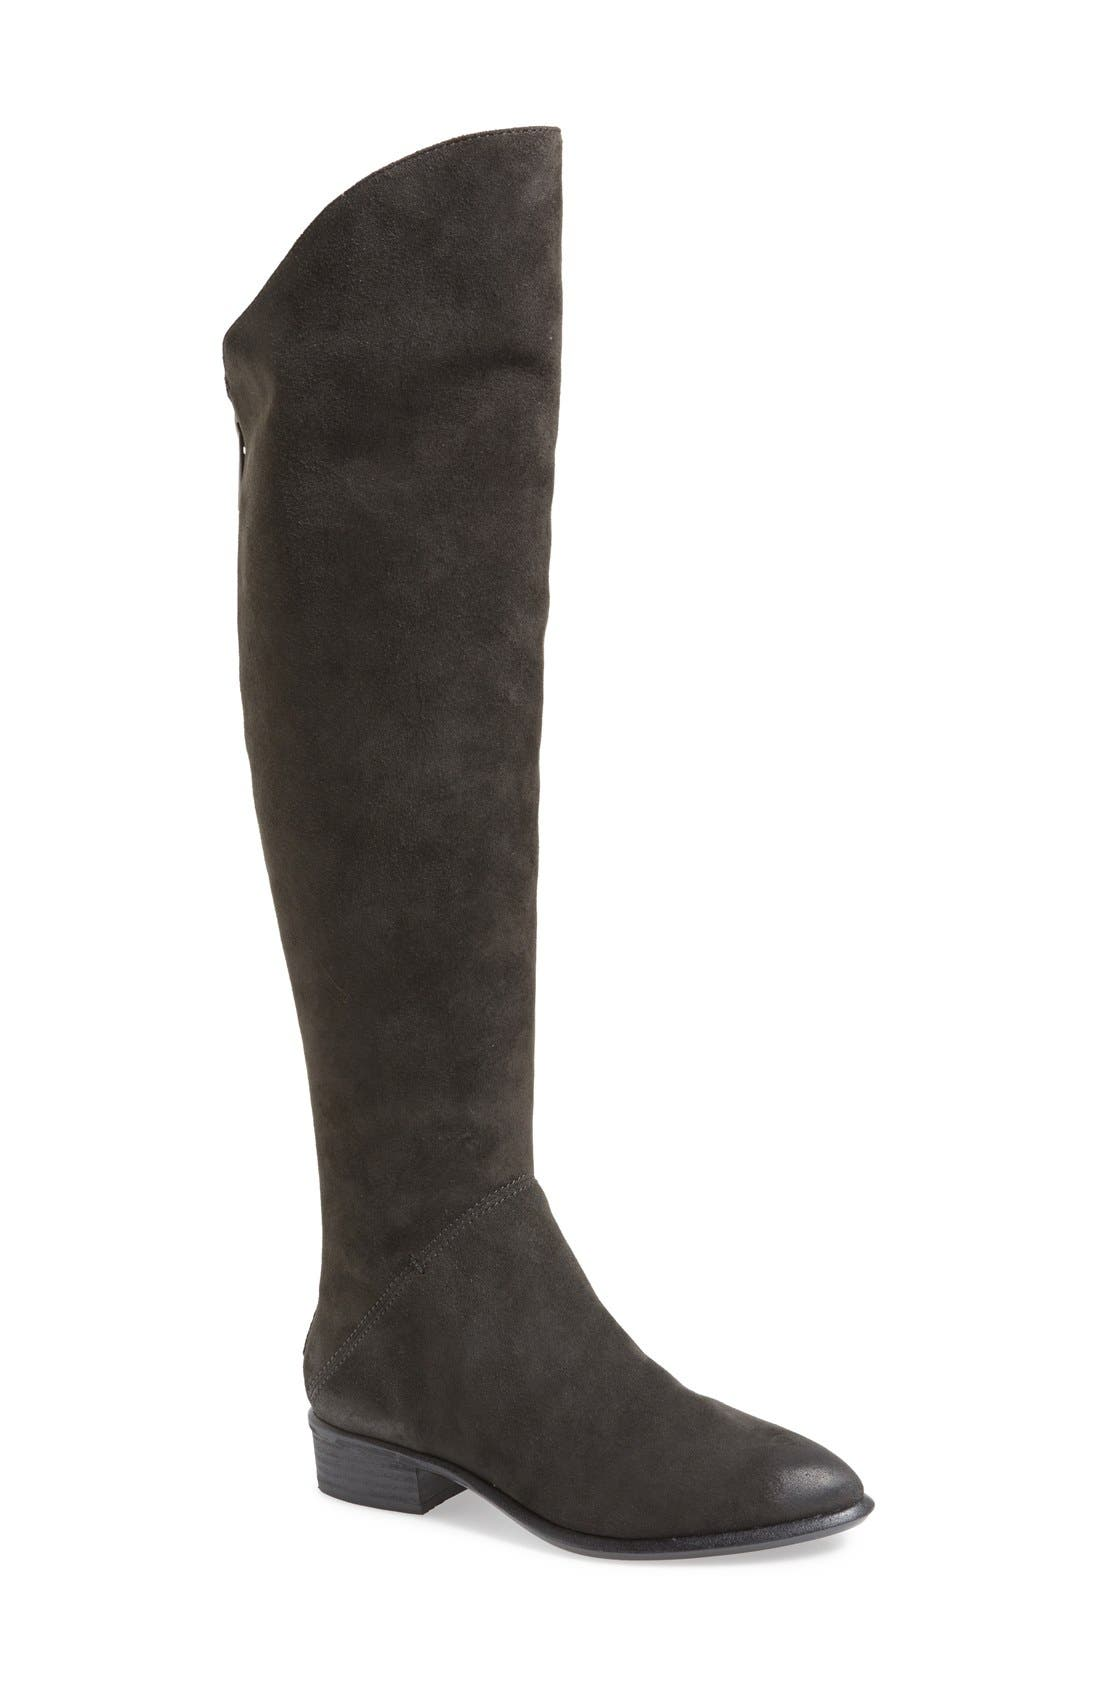 Main Image - Dolce Vita 'Meris' Boot (Women)